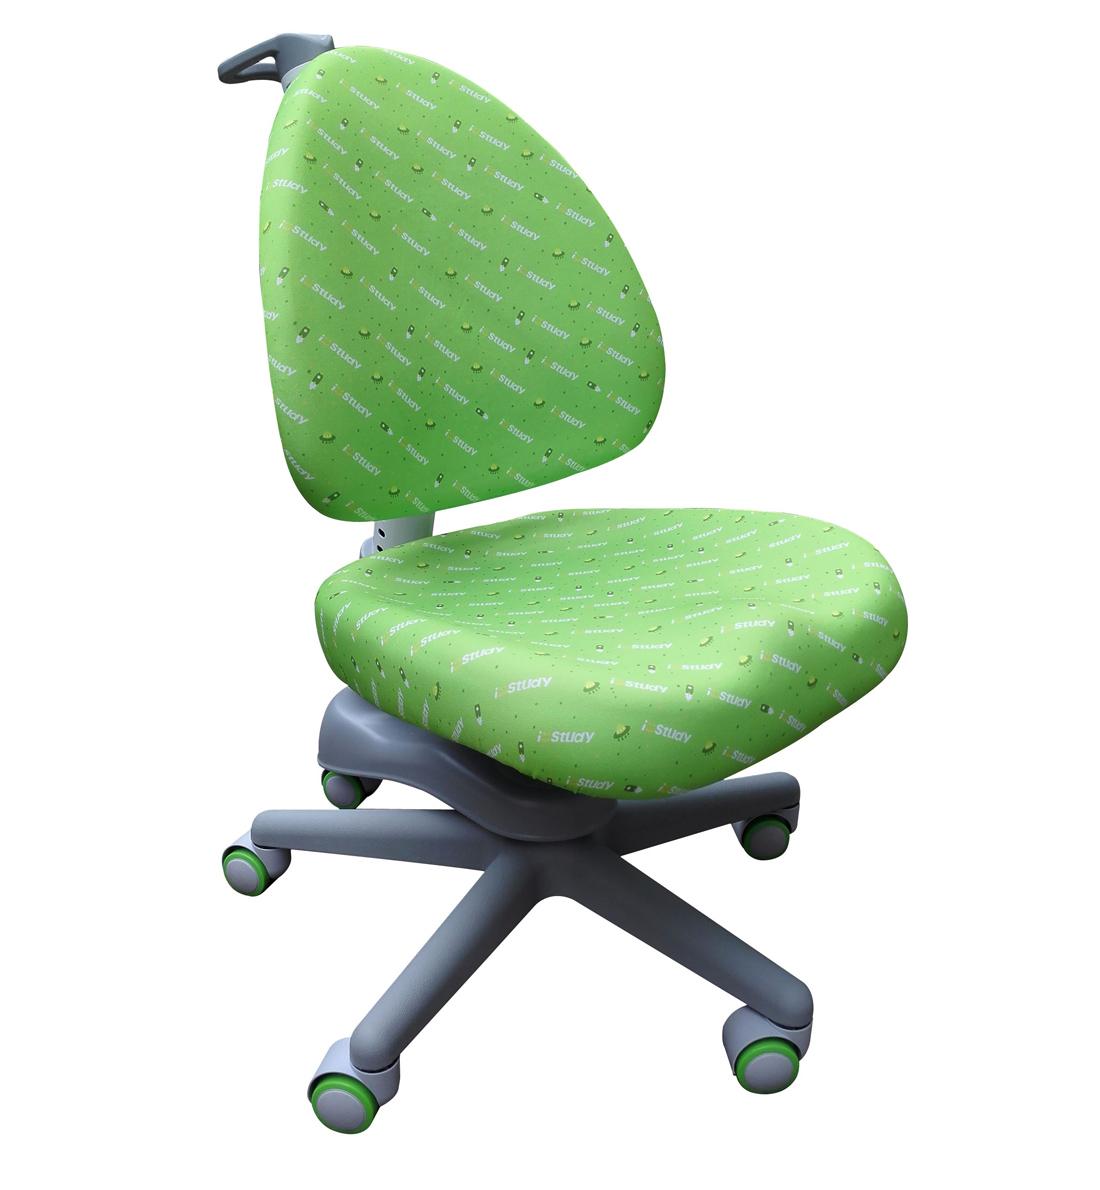 Scaun Faworit Ergodesk, Green, L42xl42xh29/45 cm